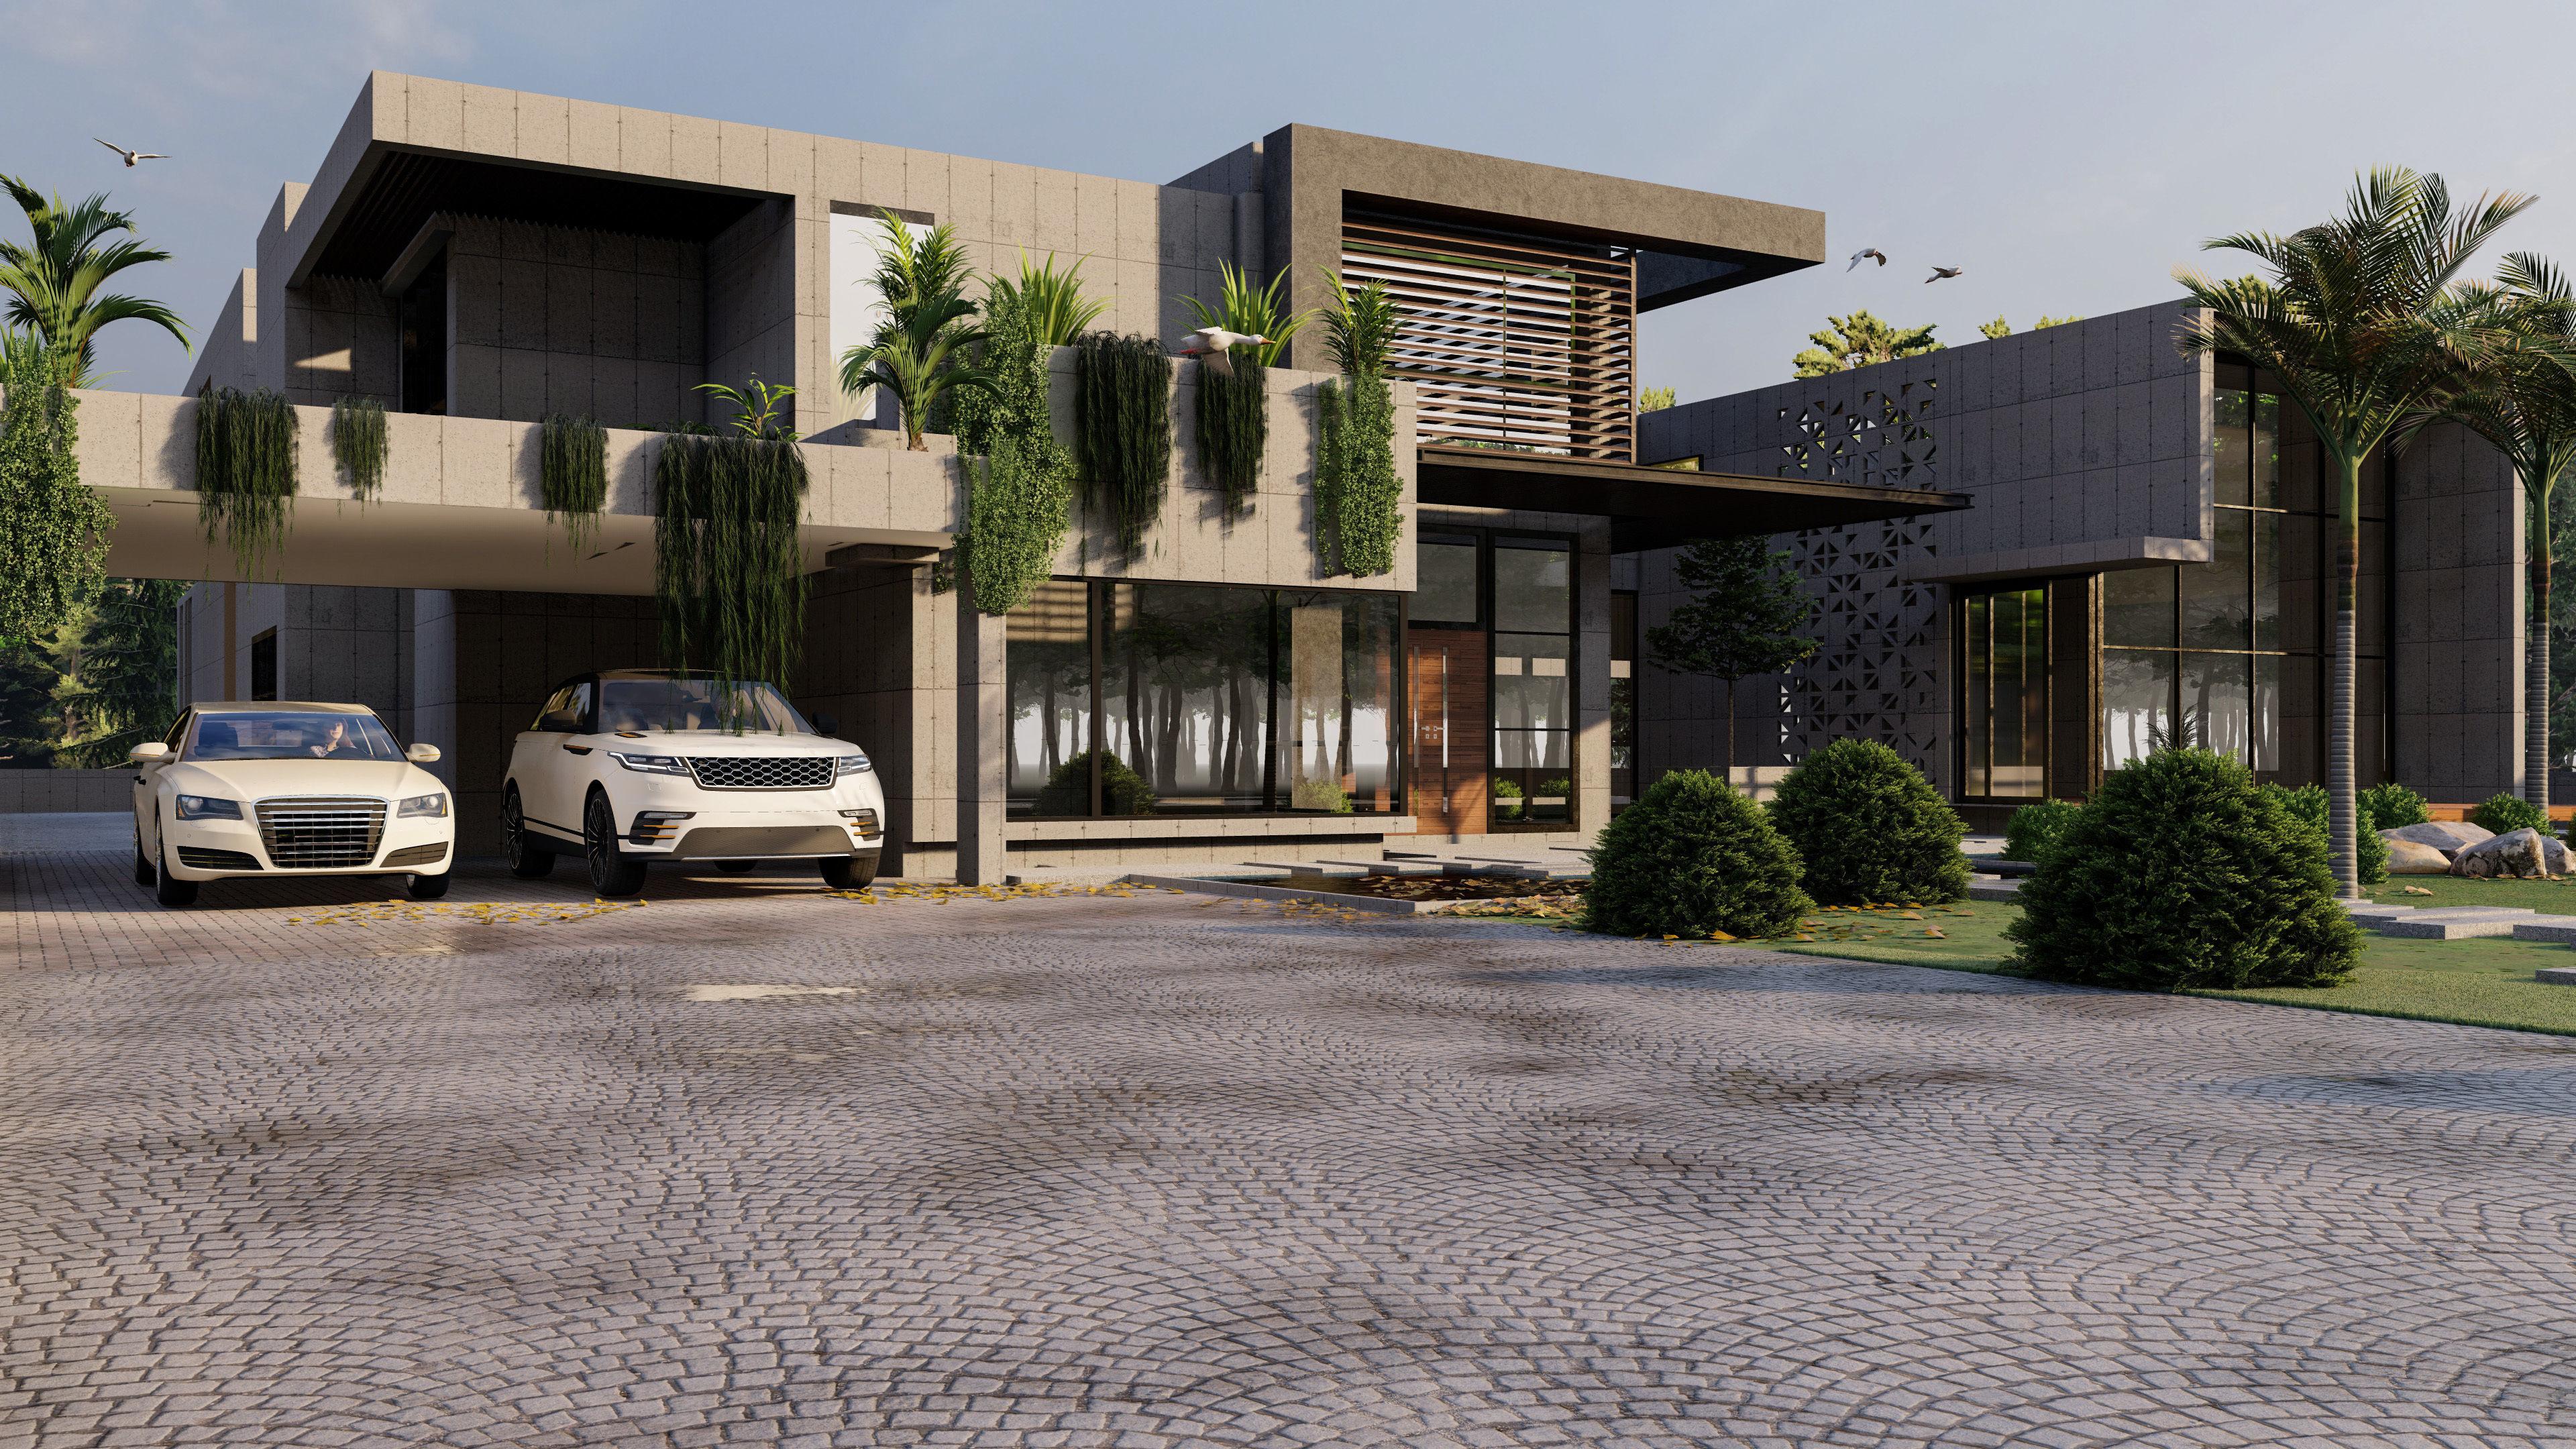 3D MODERN LUXURY HOUSE MODEL AND RENDER MODERN HOUSE